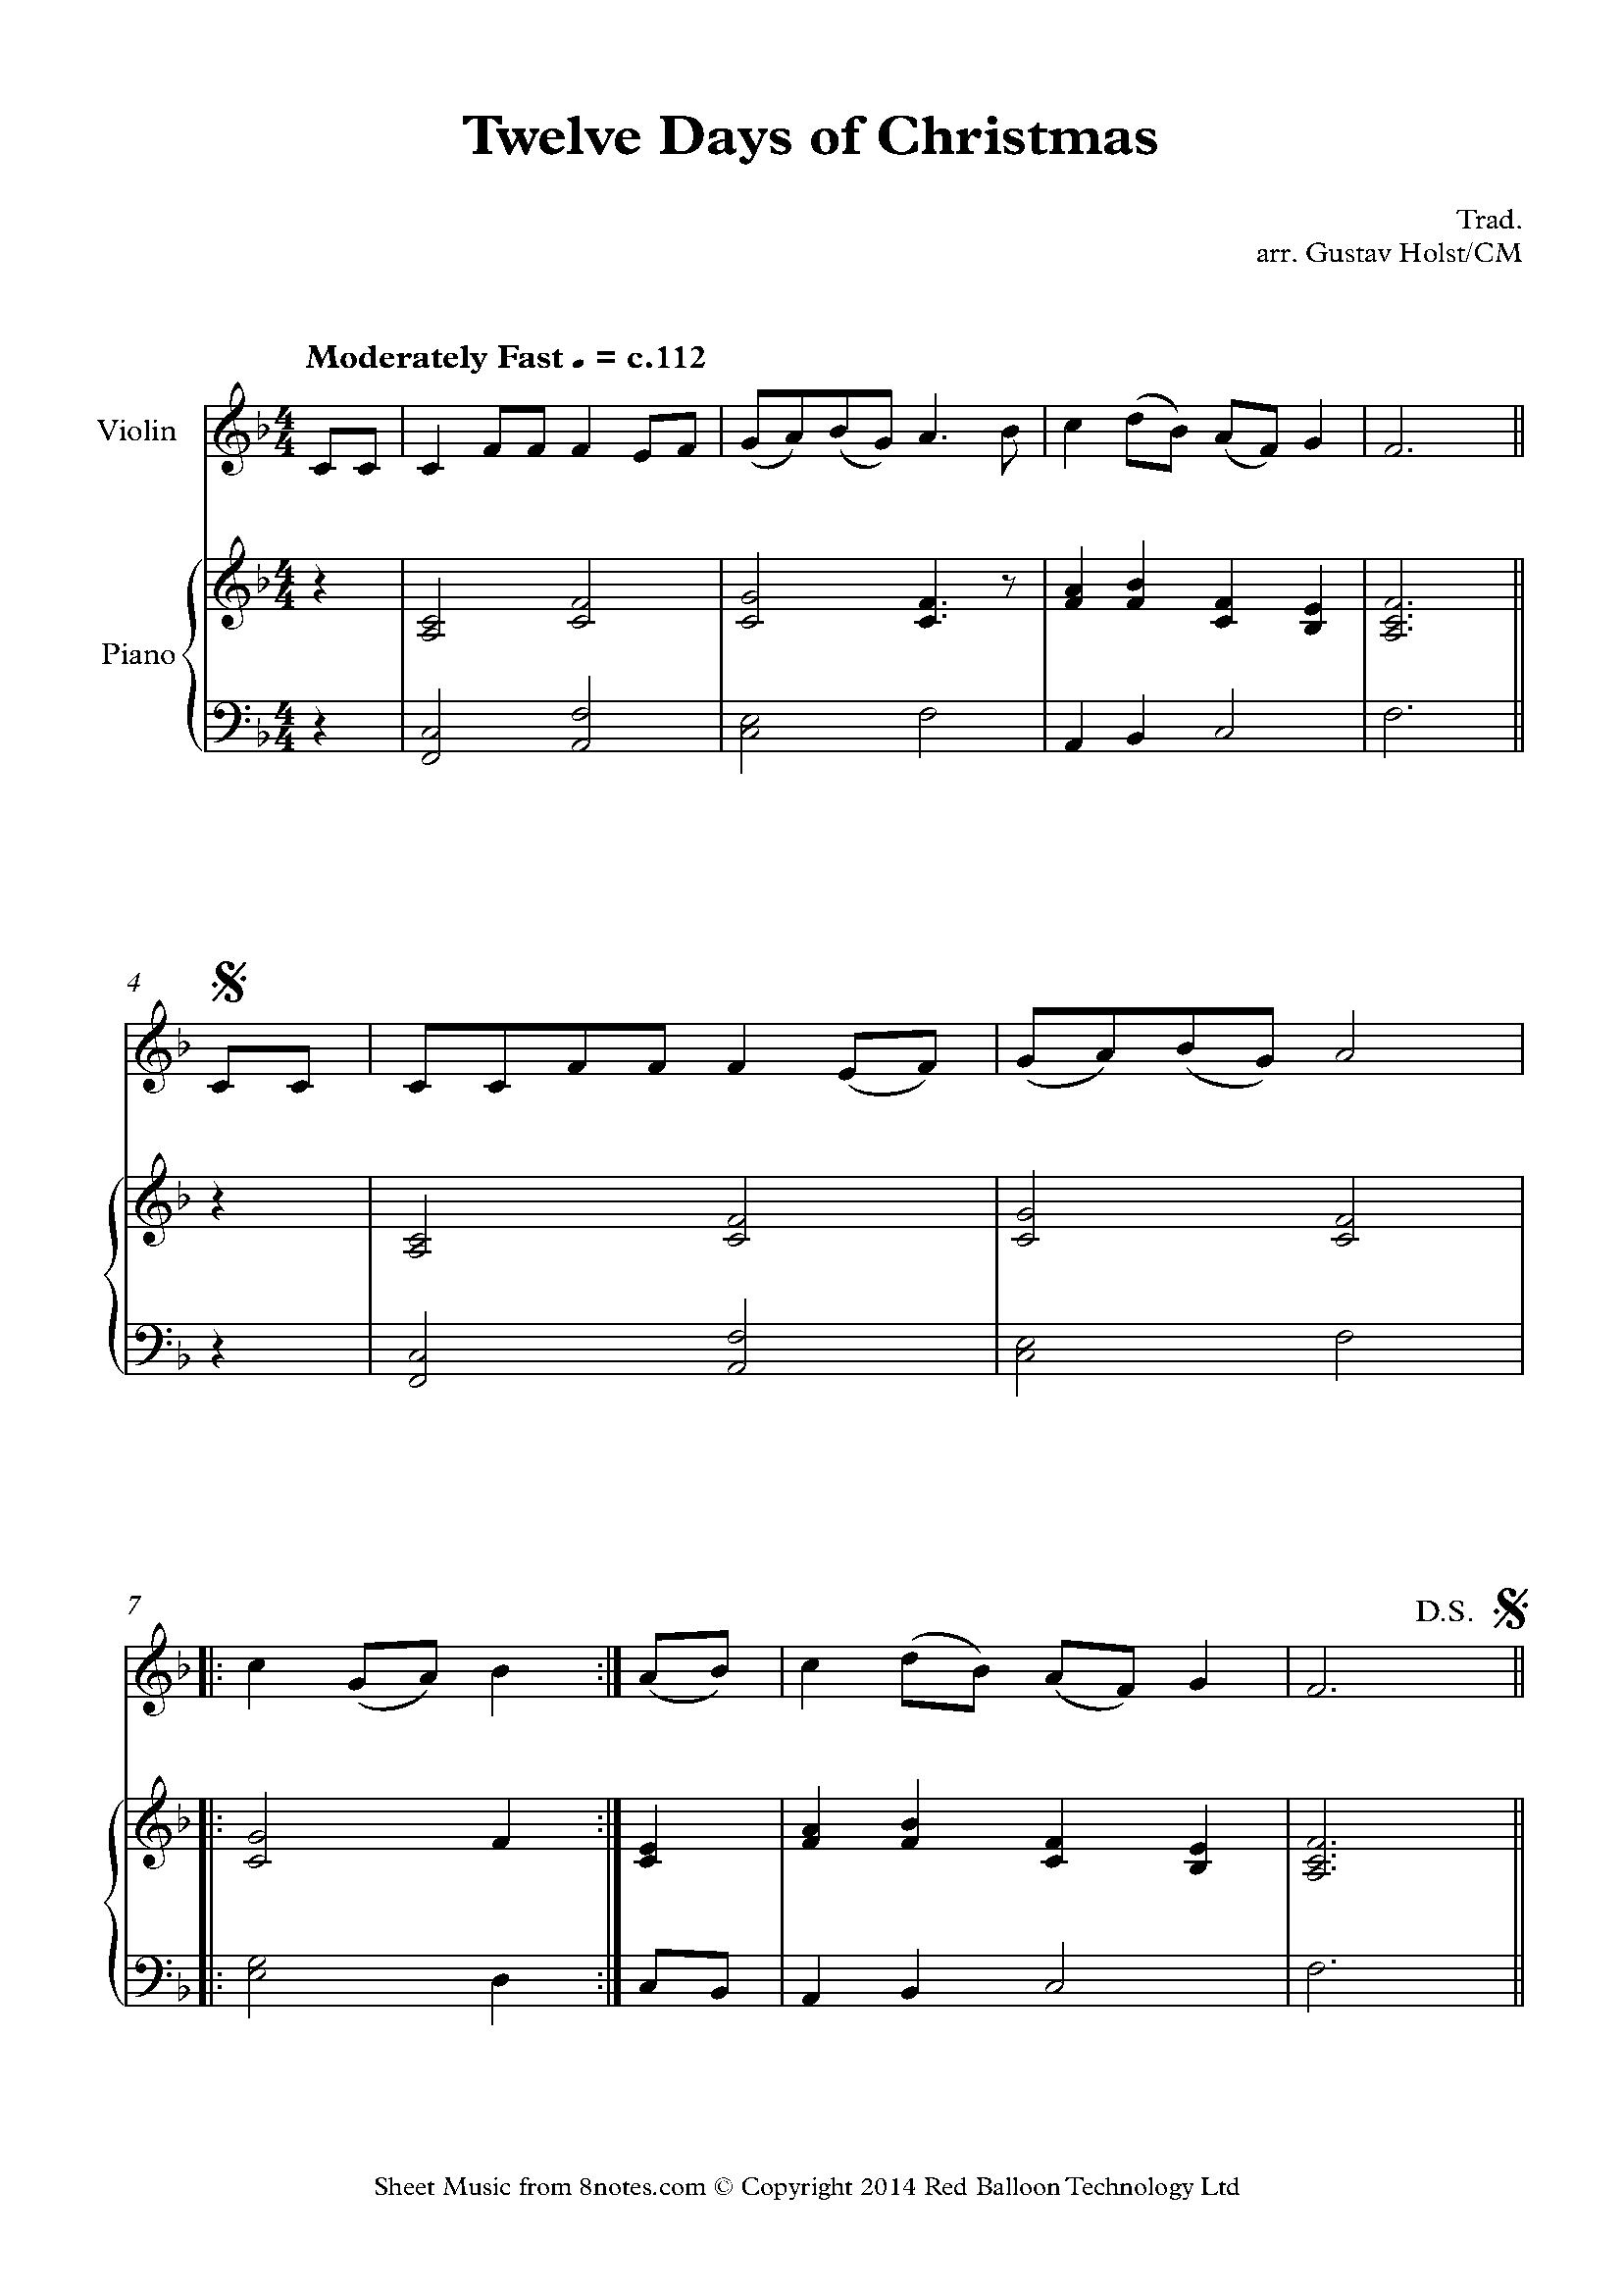 12 Days of Christmas sheet music for Violin - 8notes.com | Free Violin Sheet Music | Pinterest ...